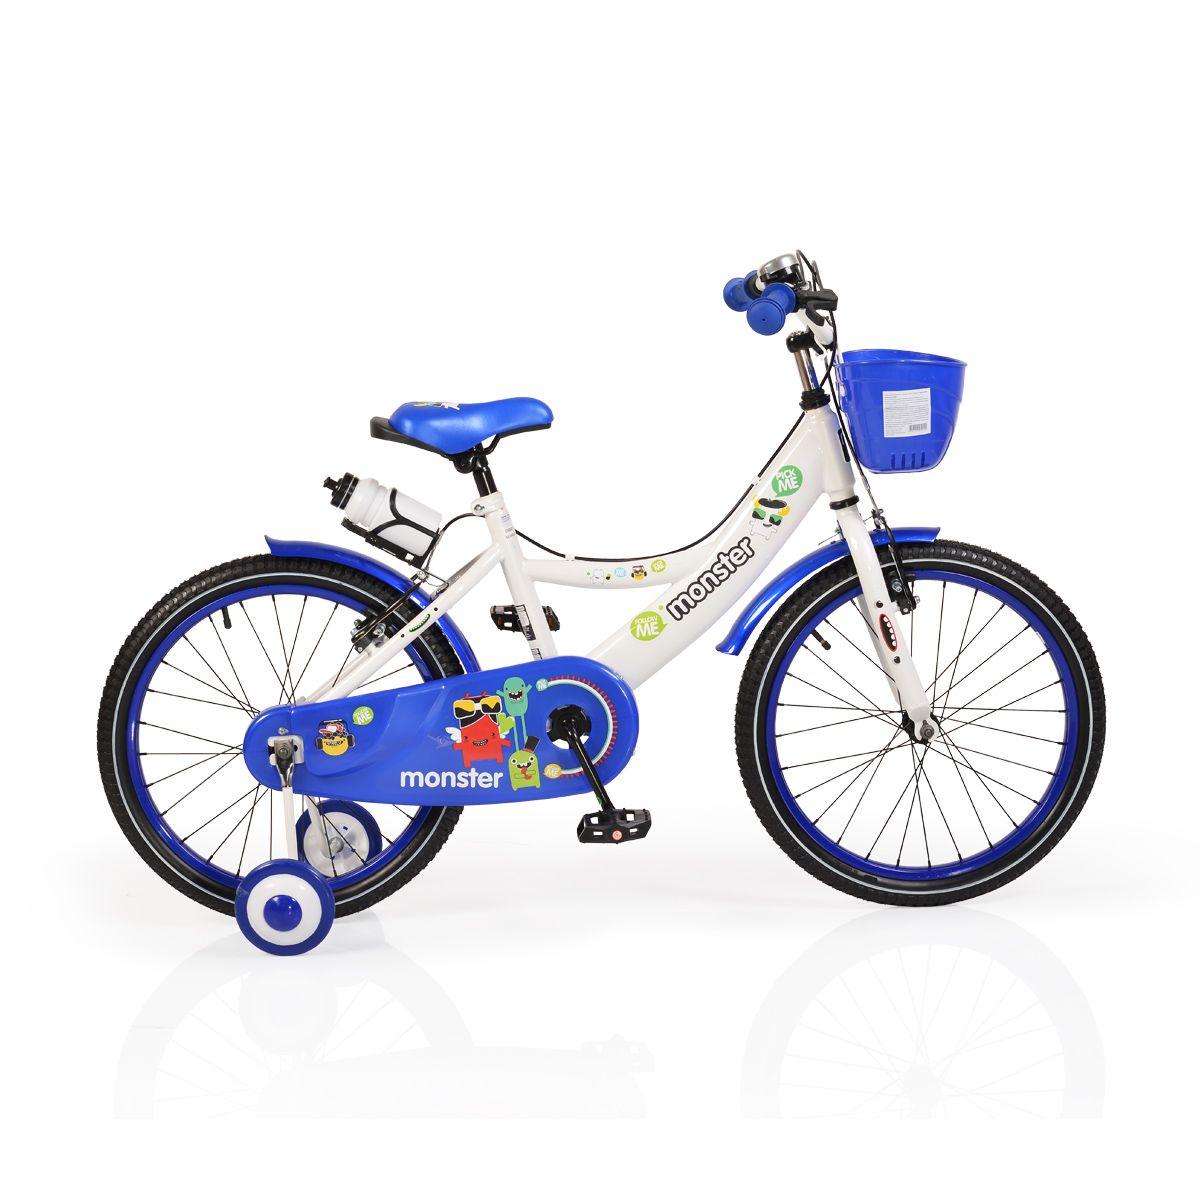 Bicicleta Moni Monster 20 Inch Blue imagine hippoland.ro